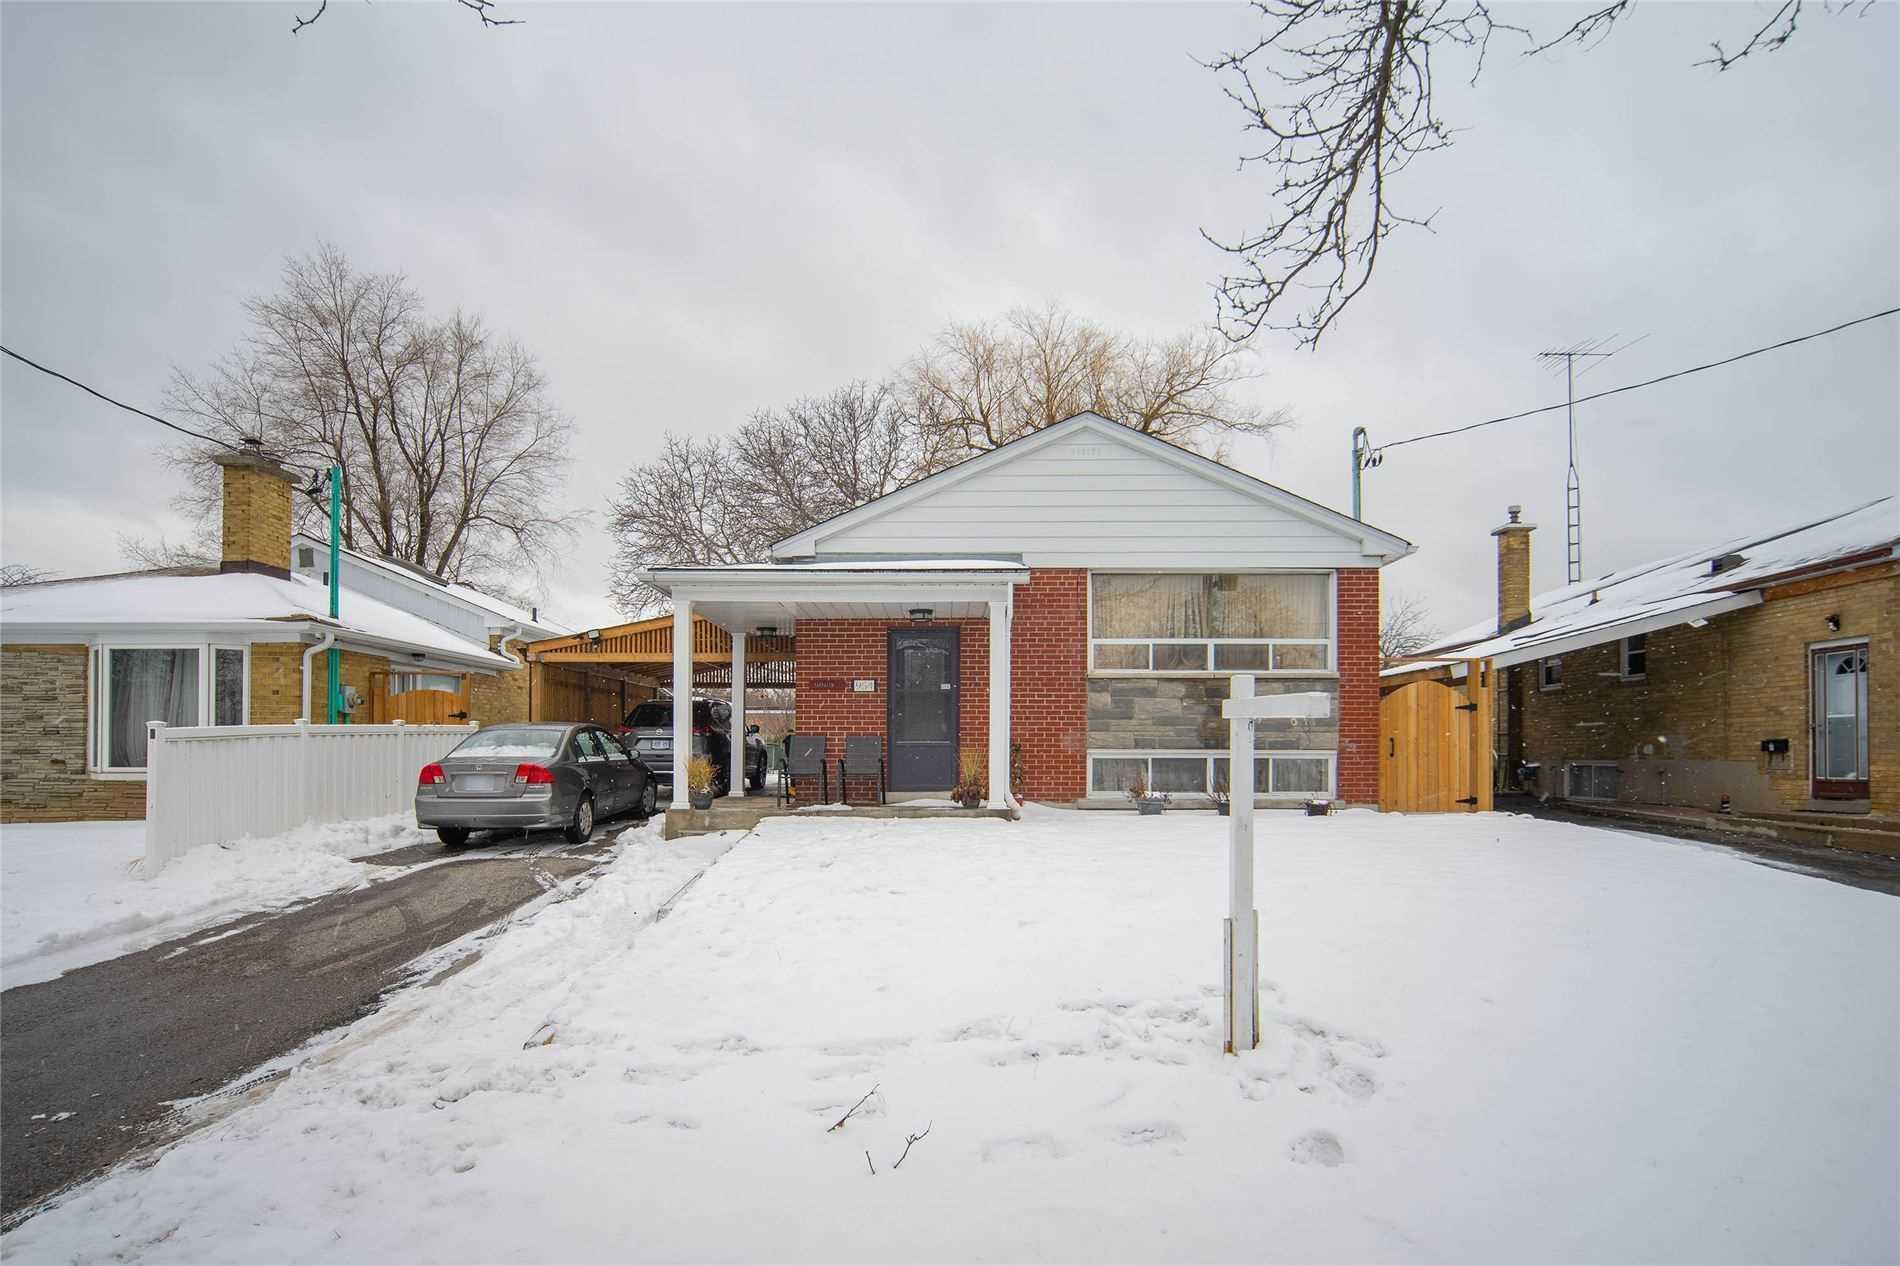 Main Photo: 954 Midland Avenue in Toronto: Eglinton East House (Bungalow) for sale (Toronto E08)  : MLS®# E4681657